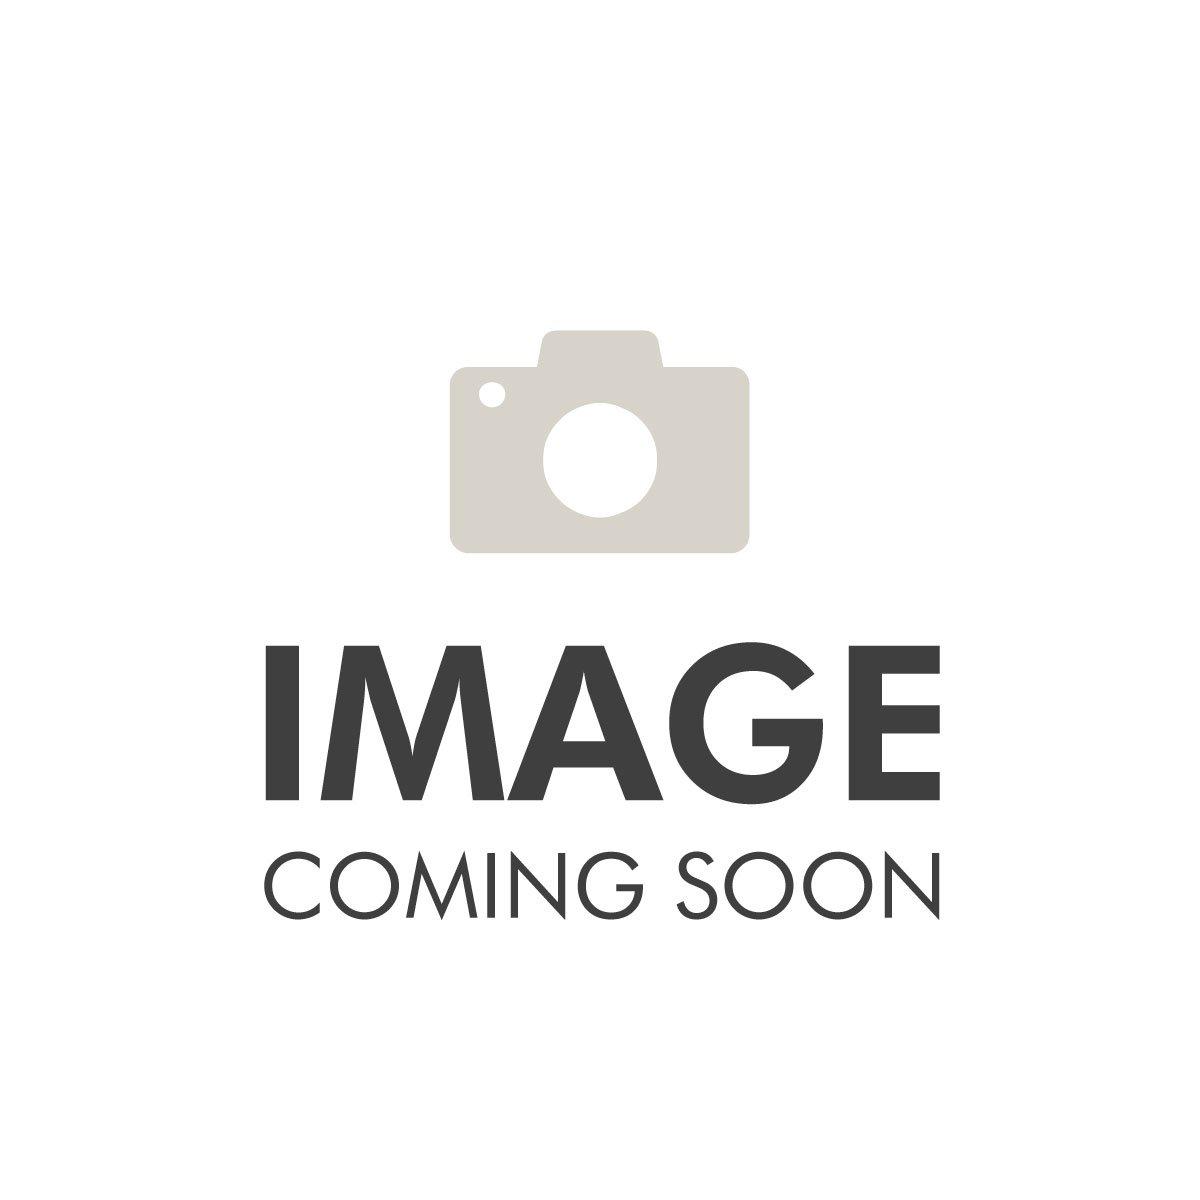 Negrini - Strain Relief for Bayonet Plug